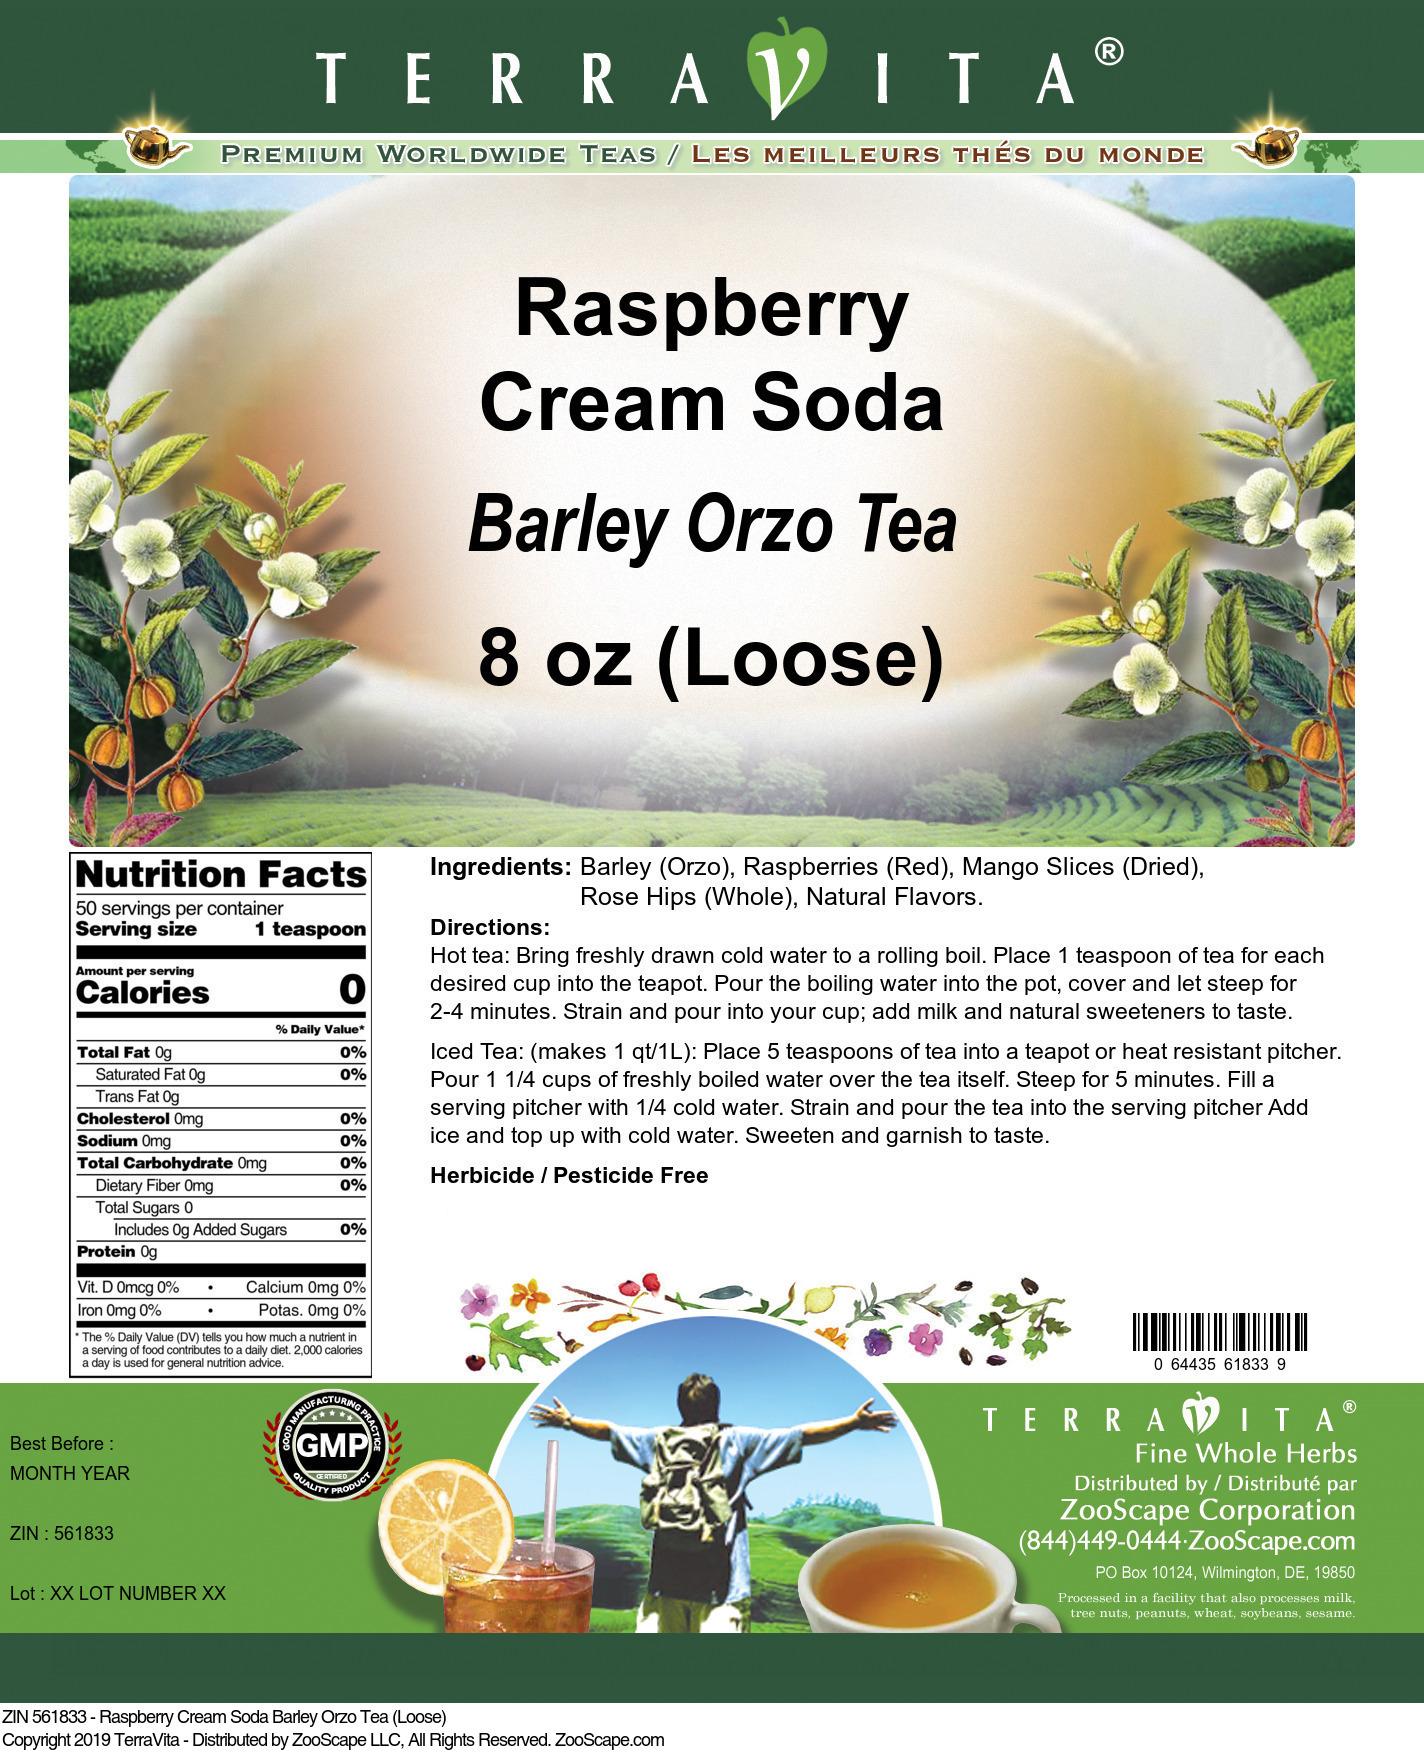 Raspberry Cream Soda Barley Orzo Tea (Loose)